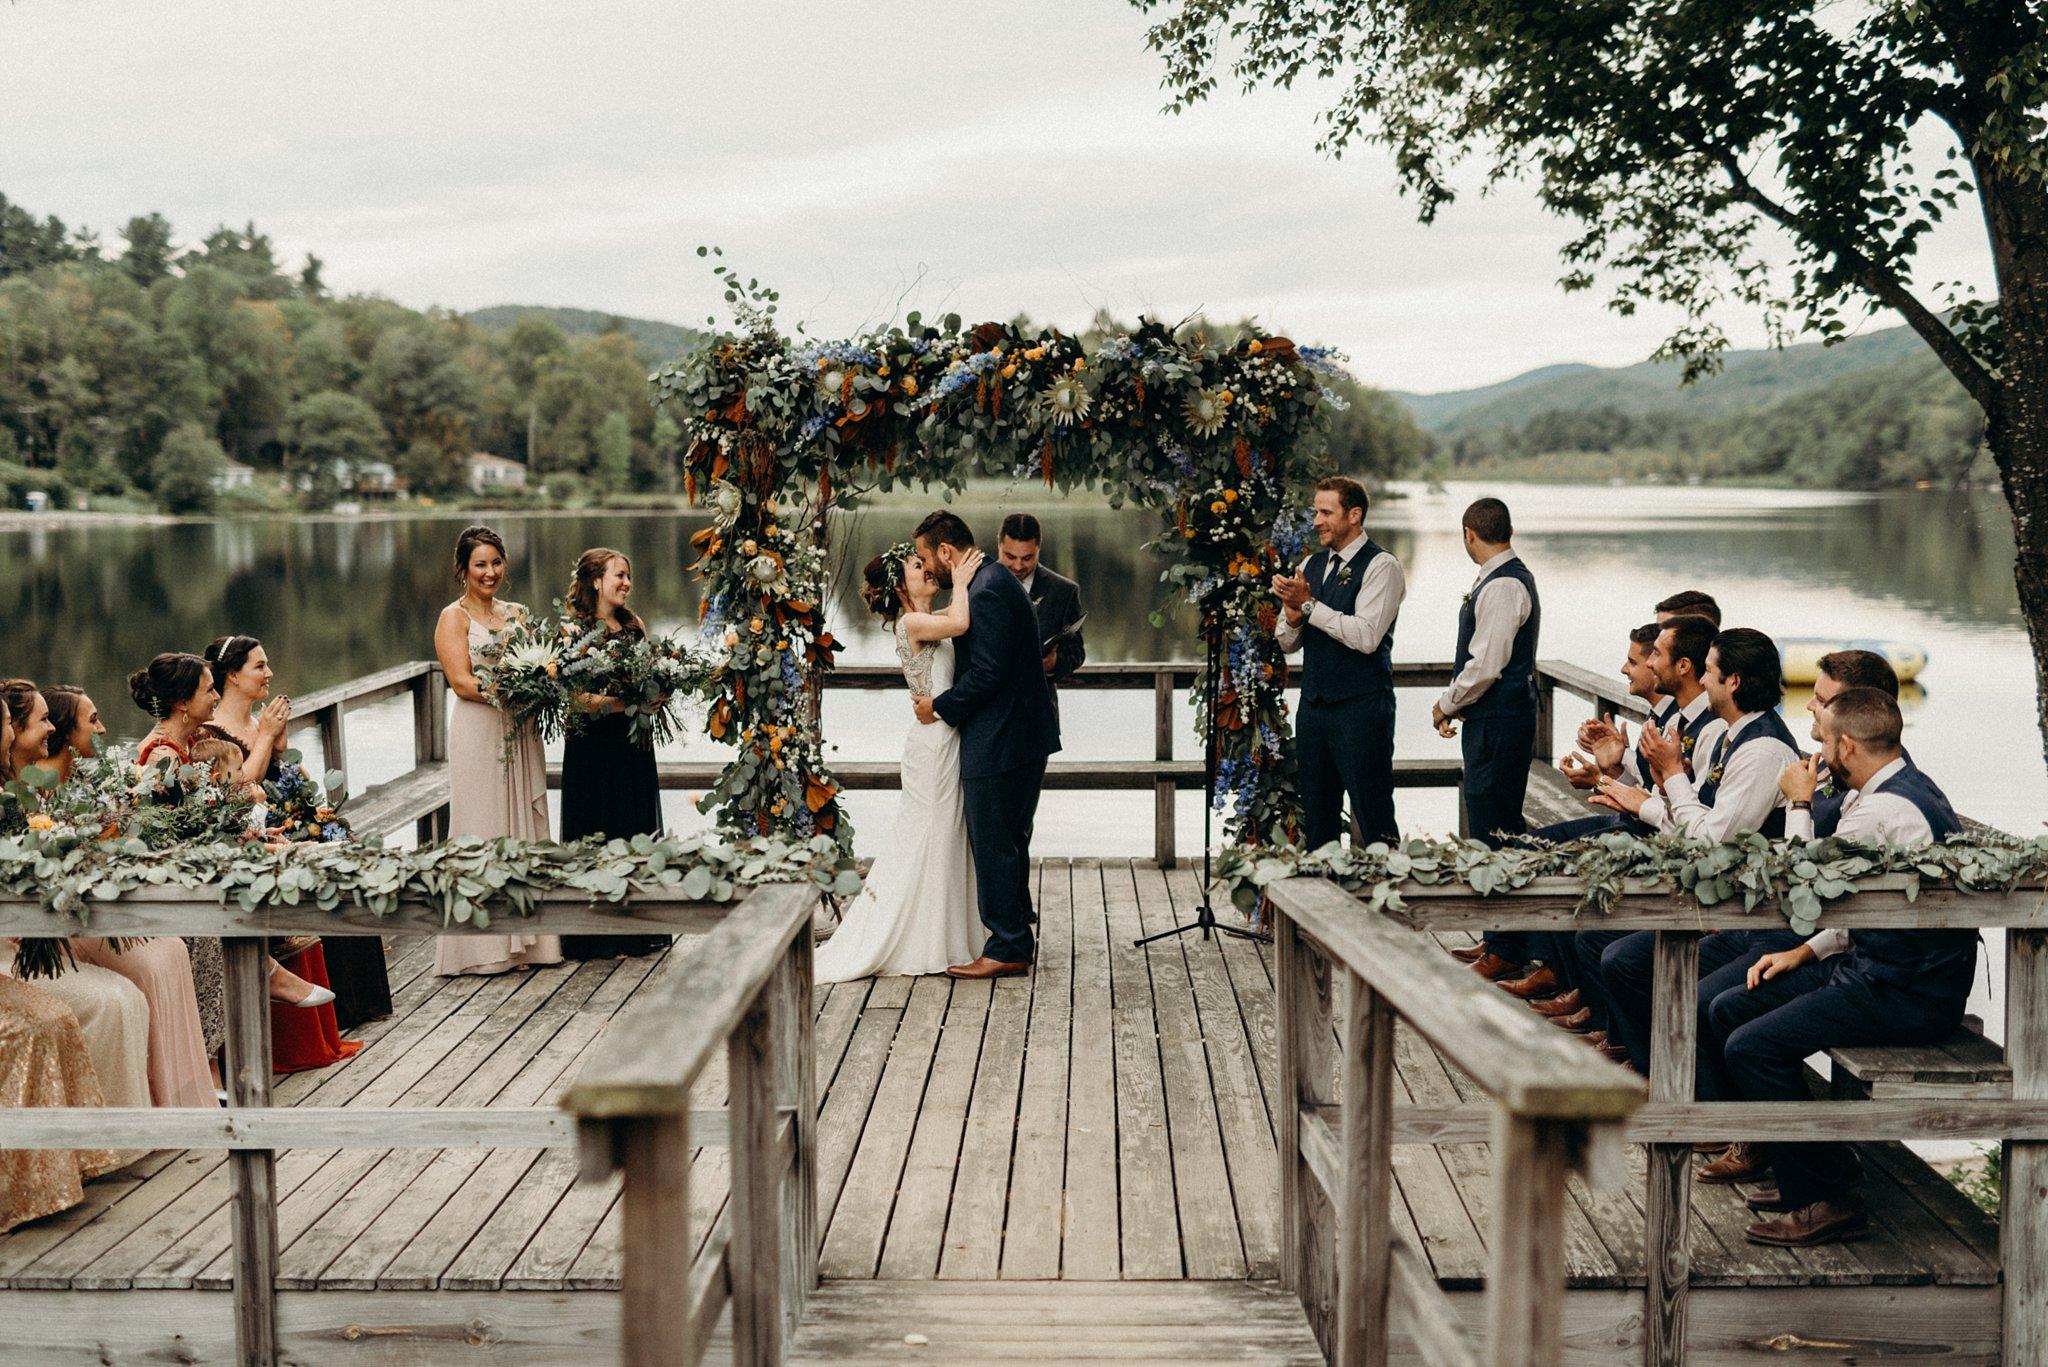 kaihla_tonai_intimate_wedding_elopement_photographer_6643.jpg